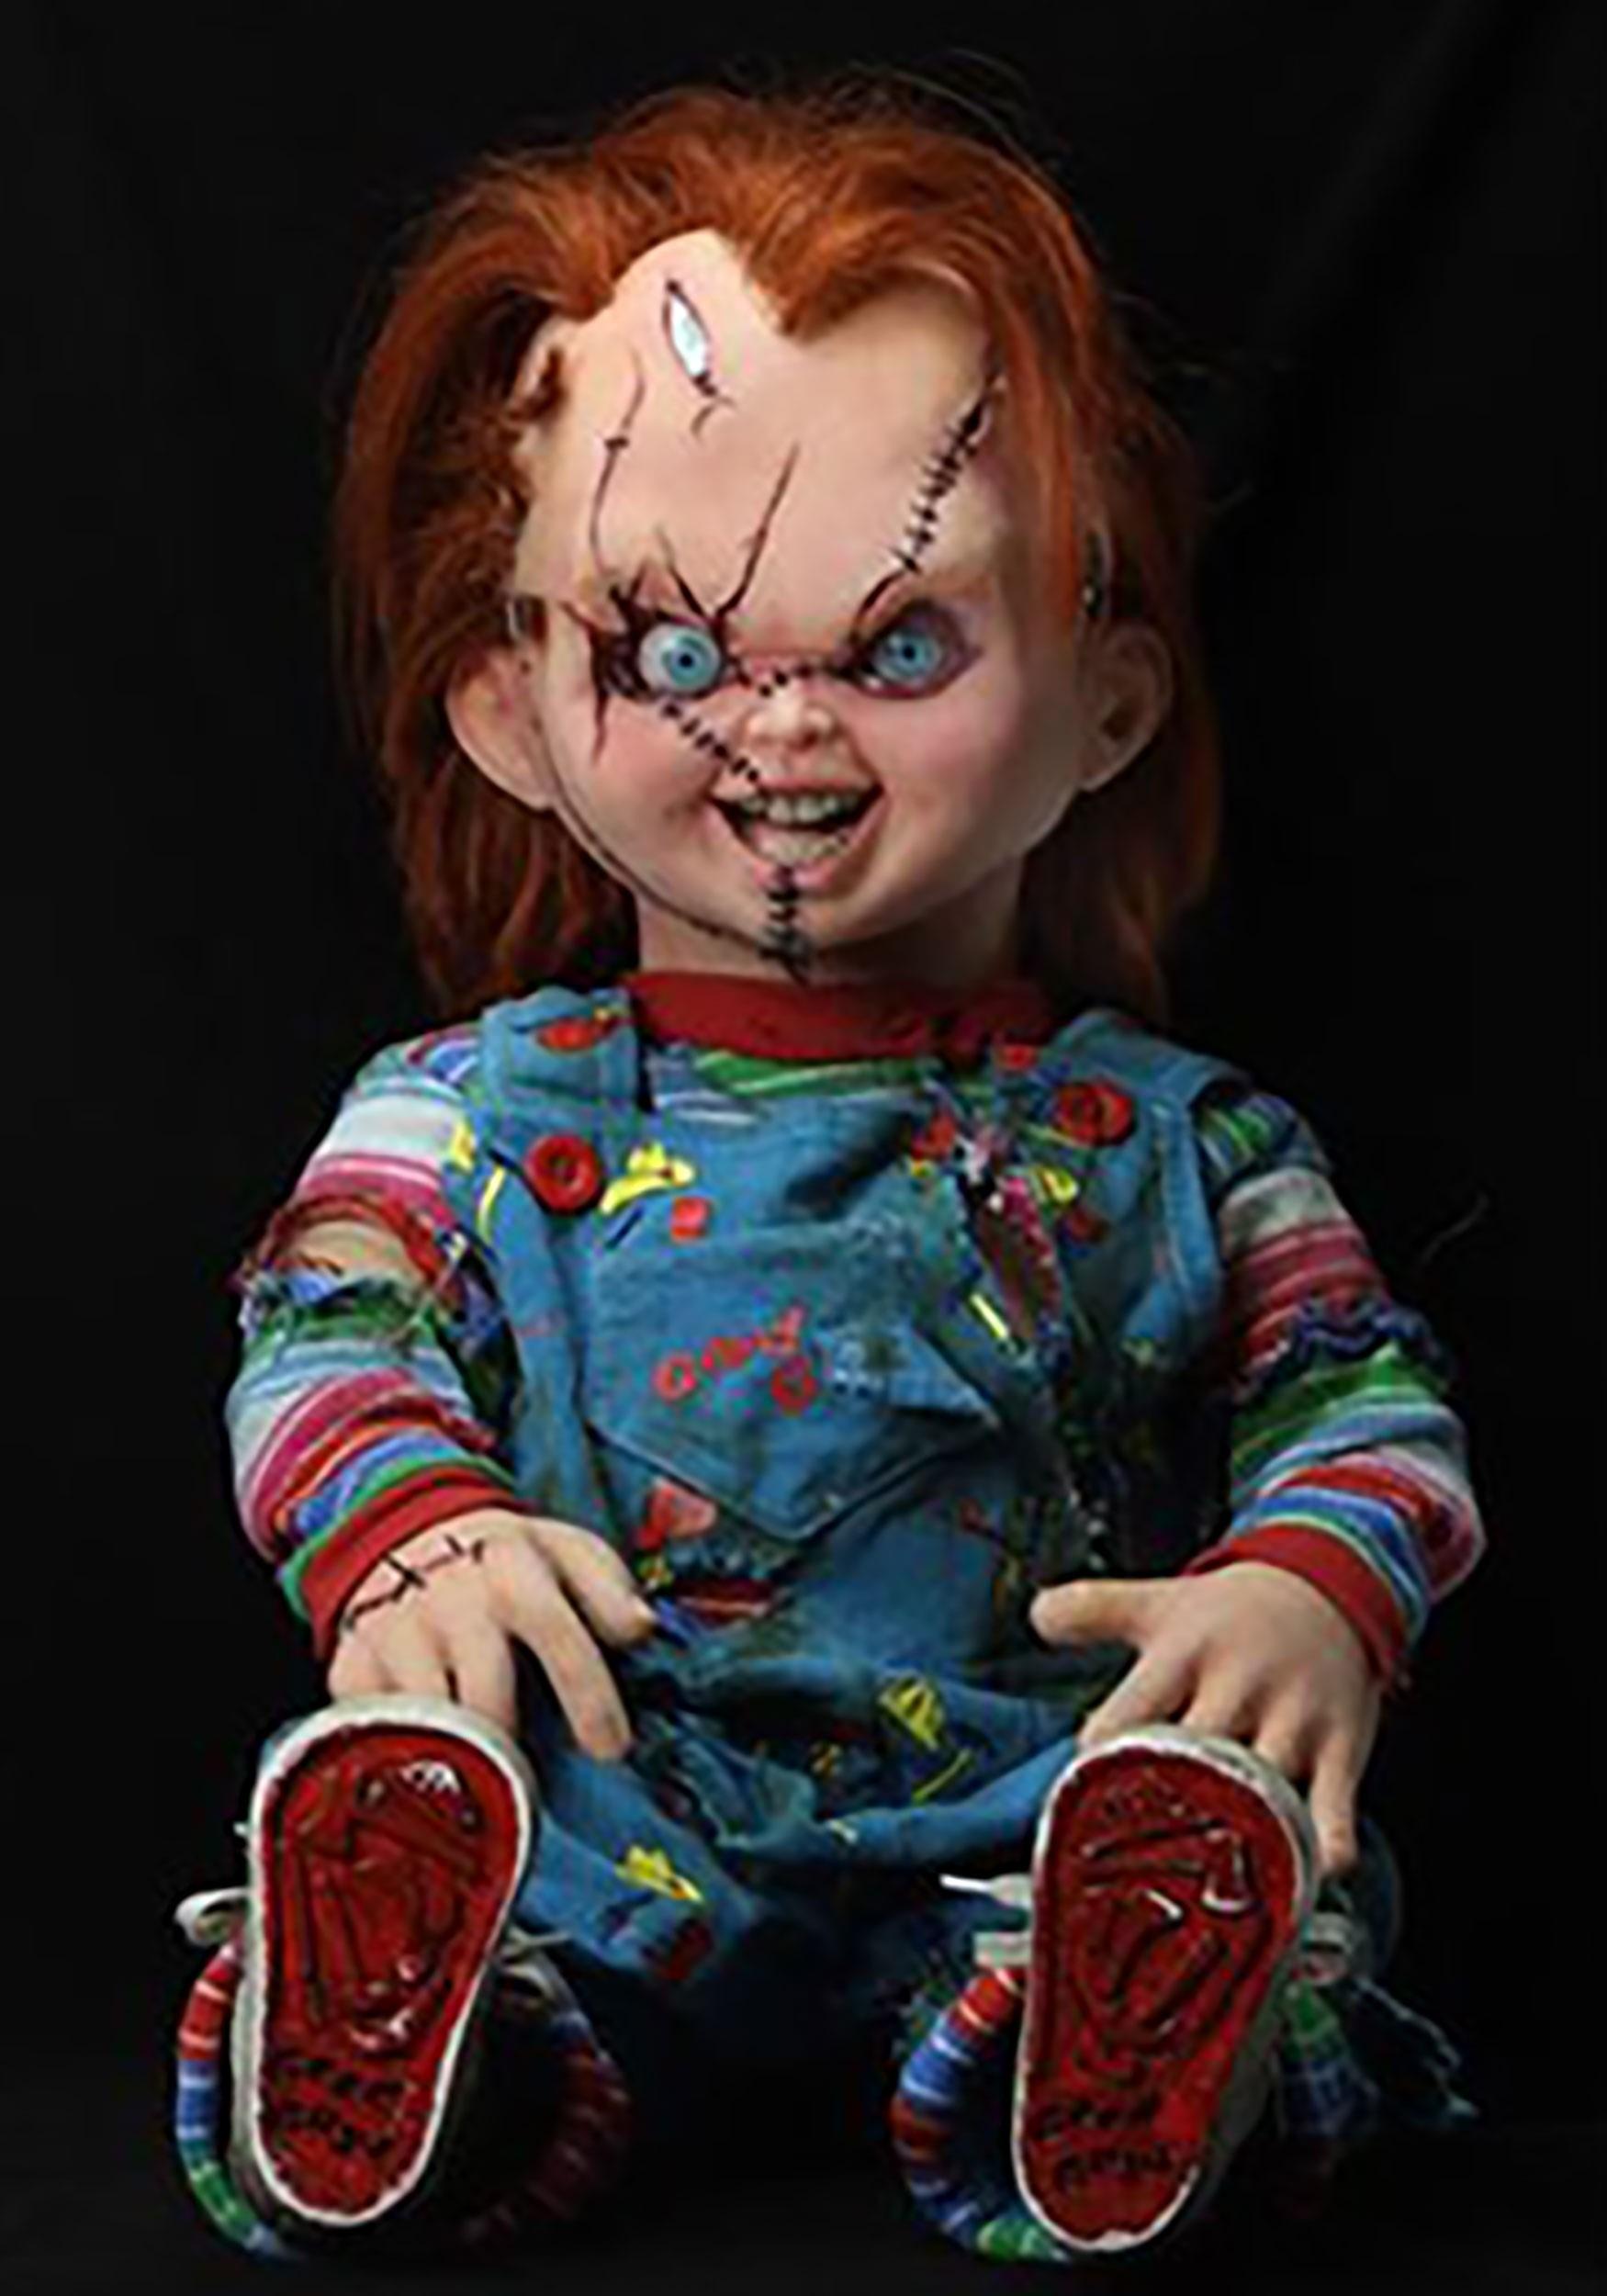 1:1 Replica Life Size Bride Of Chucky